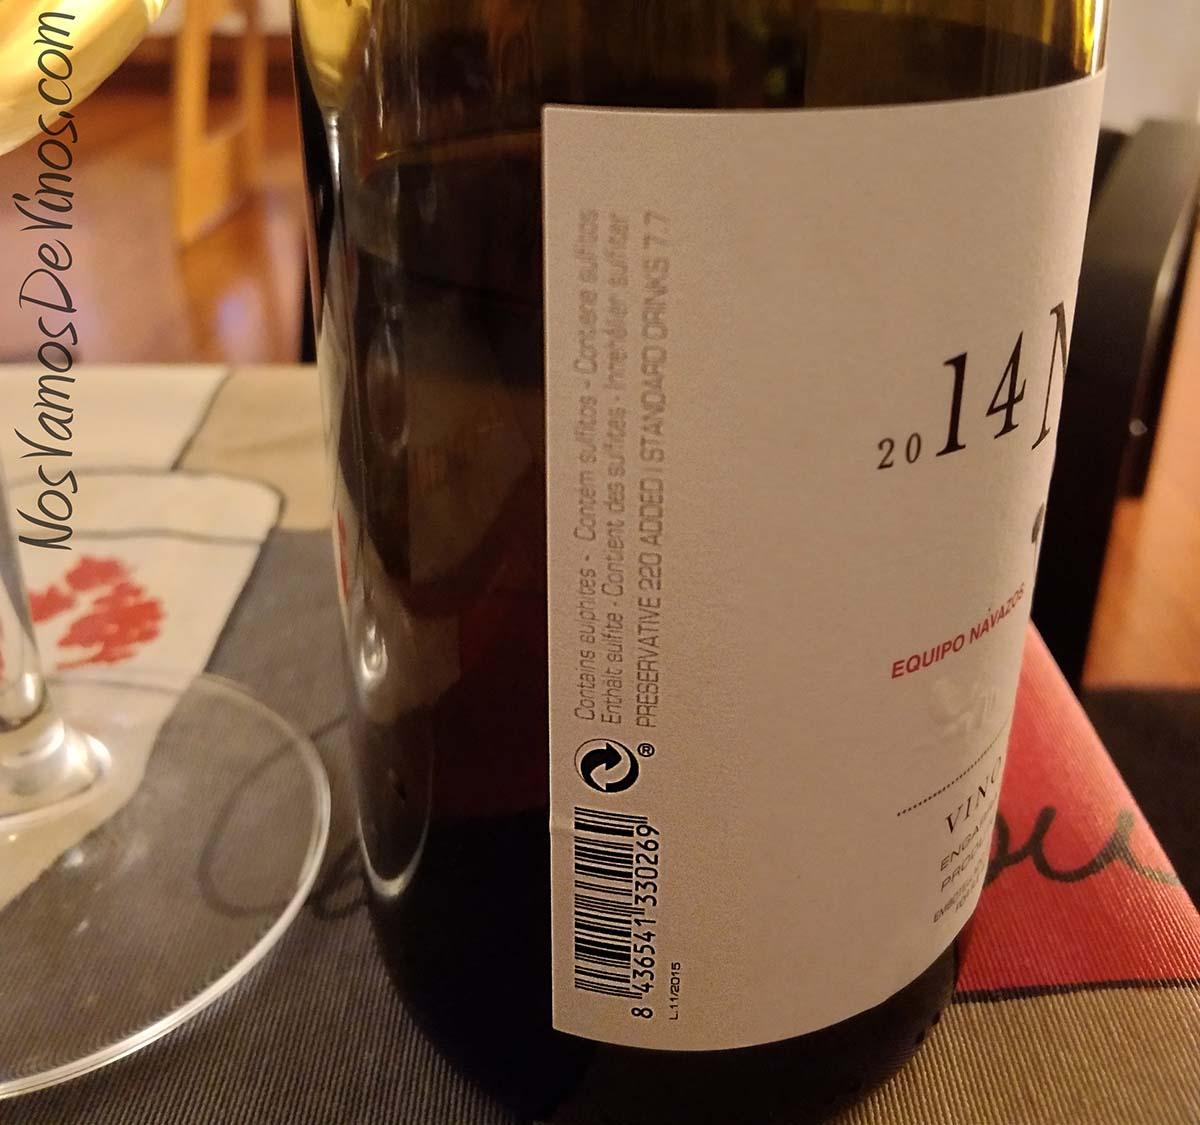 Navazos Niepoort 2014 Vino Blanco Etiqueta Lateral